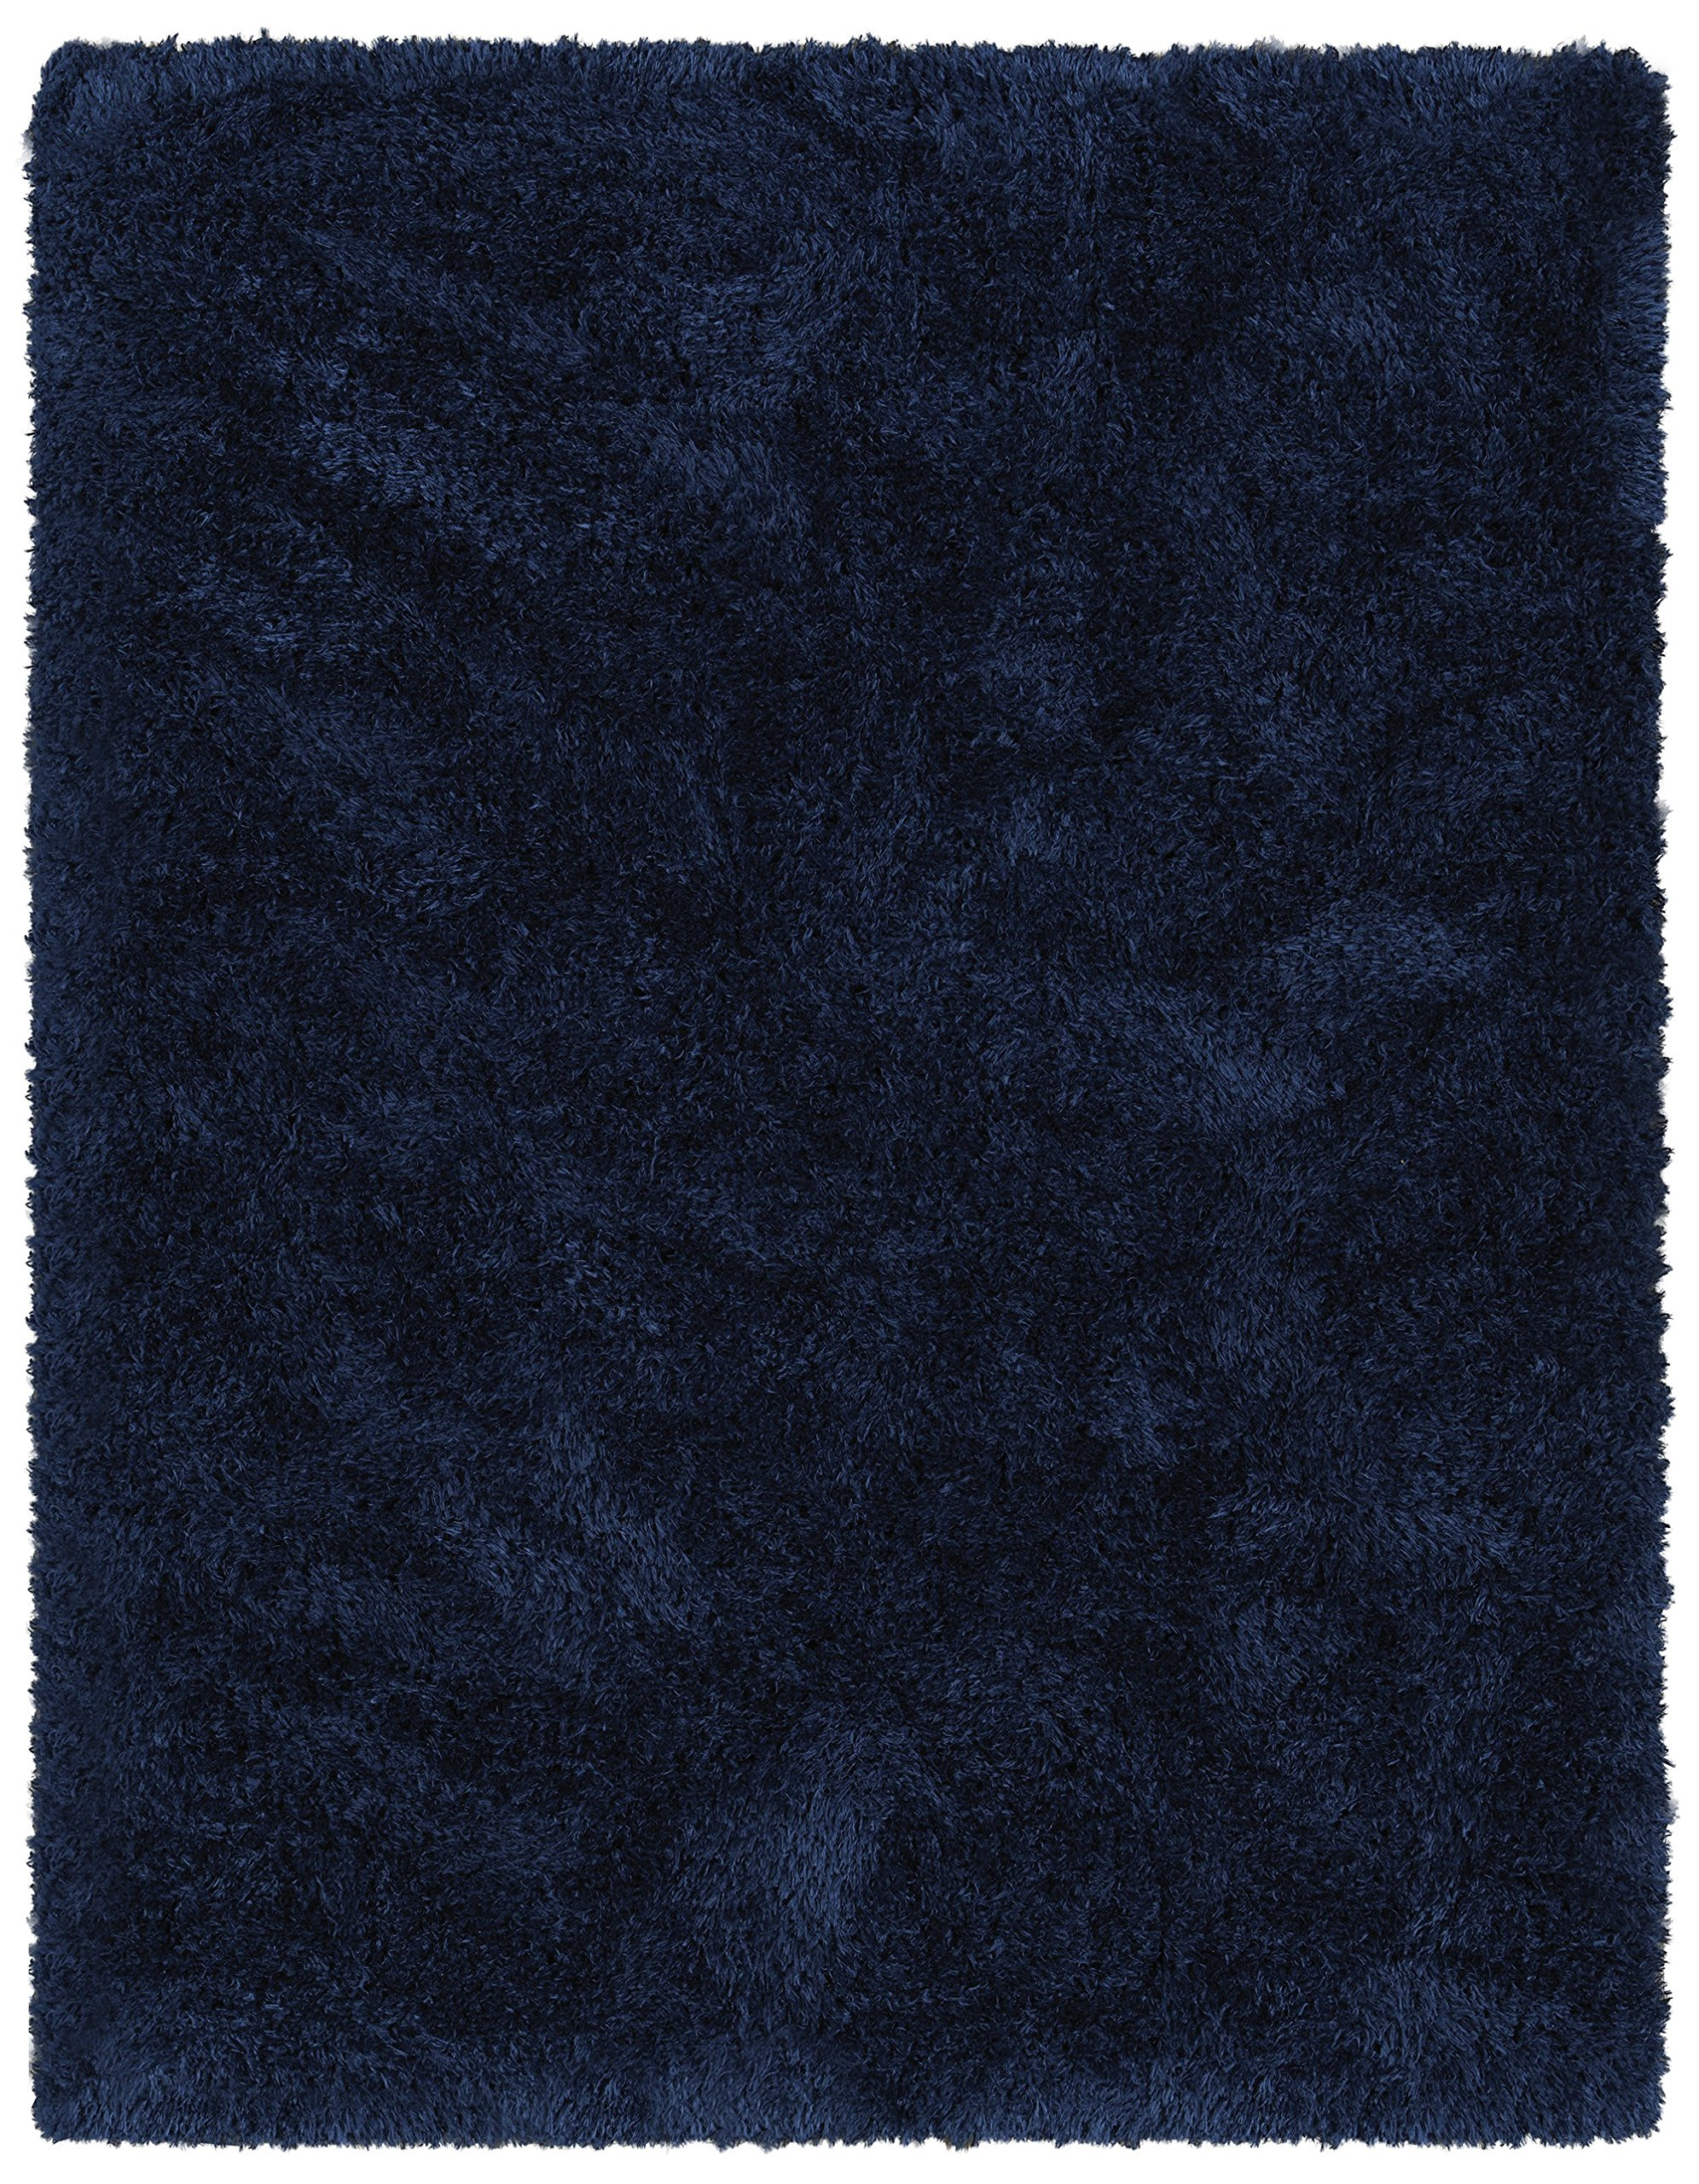 Ottomanson Flokati Collection Faux Sheepskin Shag Area Rug, 5'3''x7', Navy